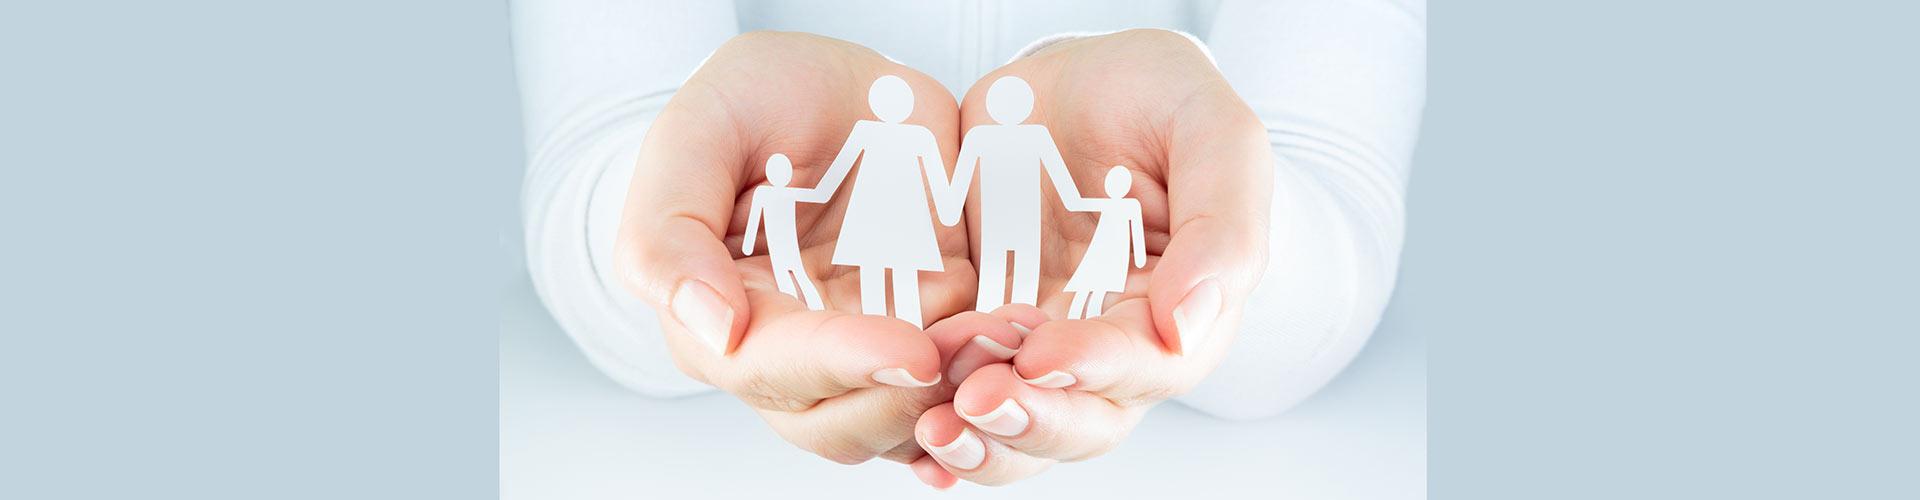 Prime Behavioral Health Family Therapy Services